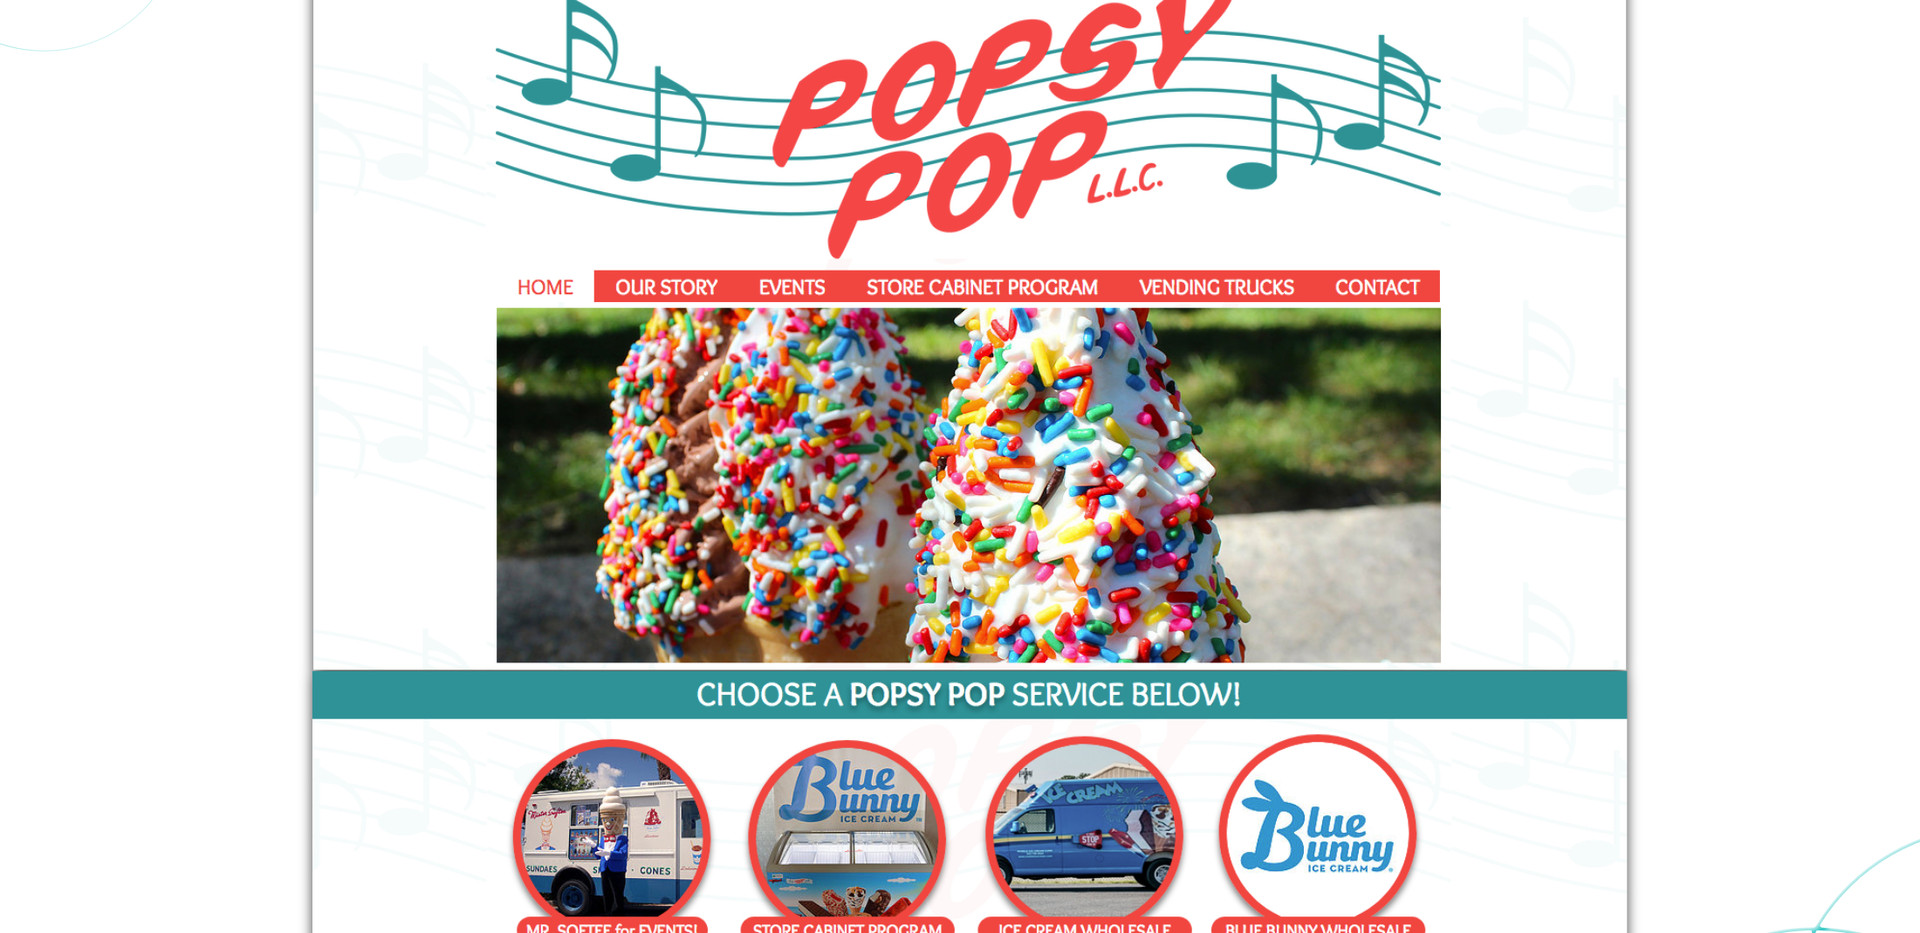 Paul-Micarelli-Popsy Pop Website.jpg